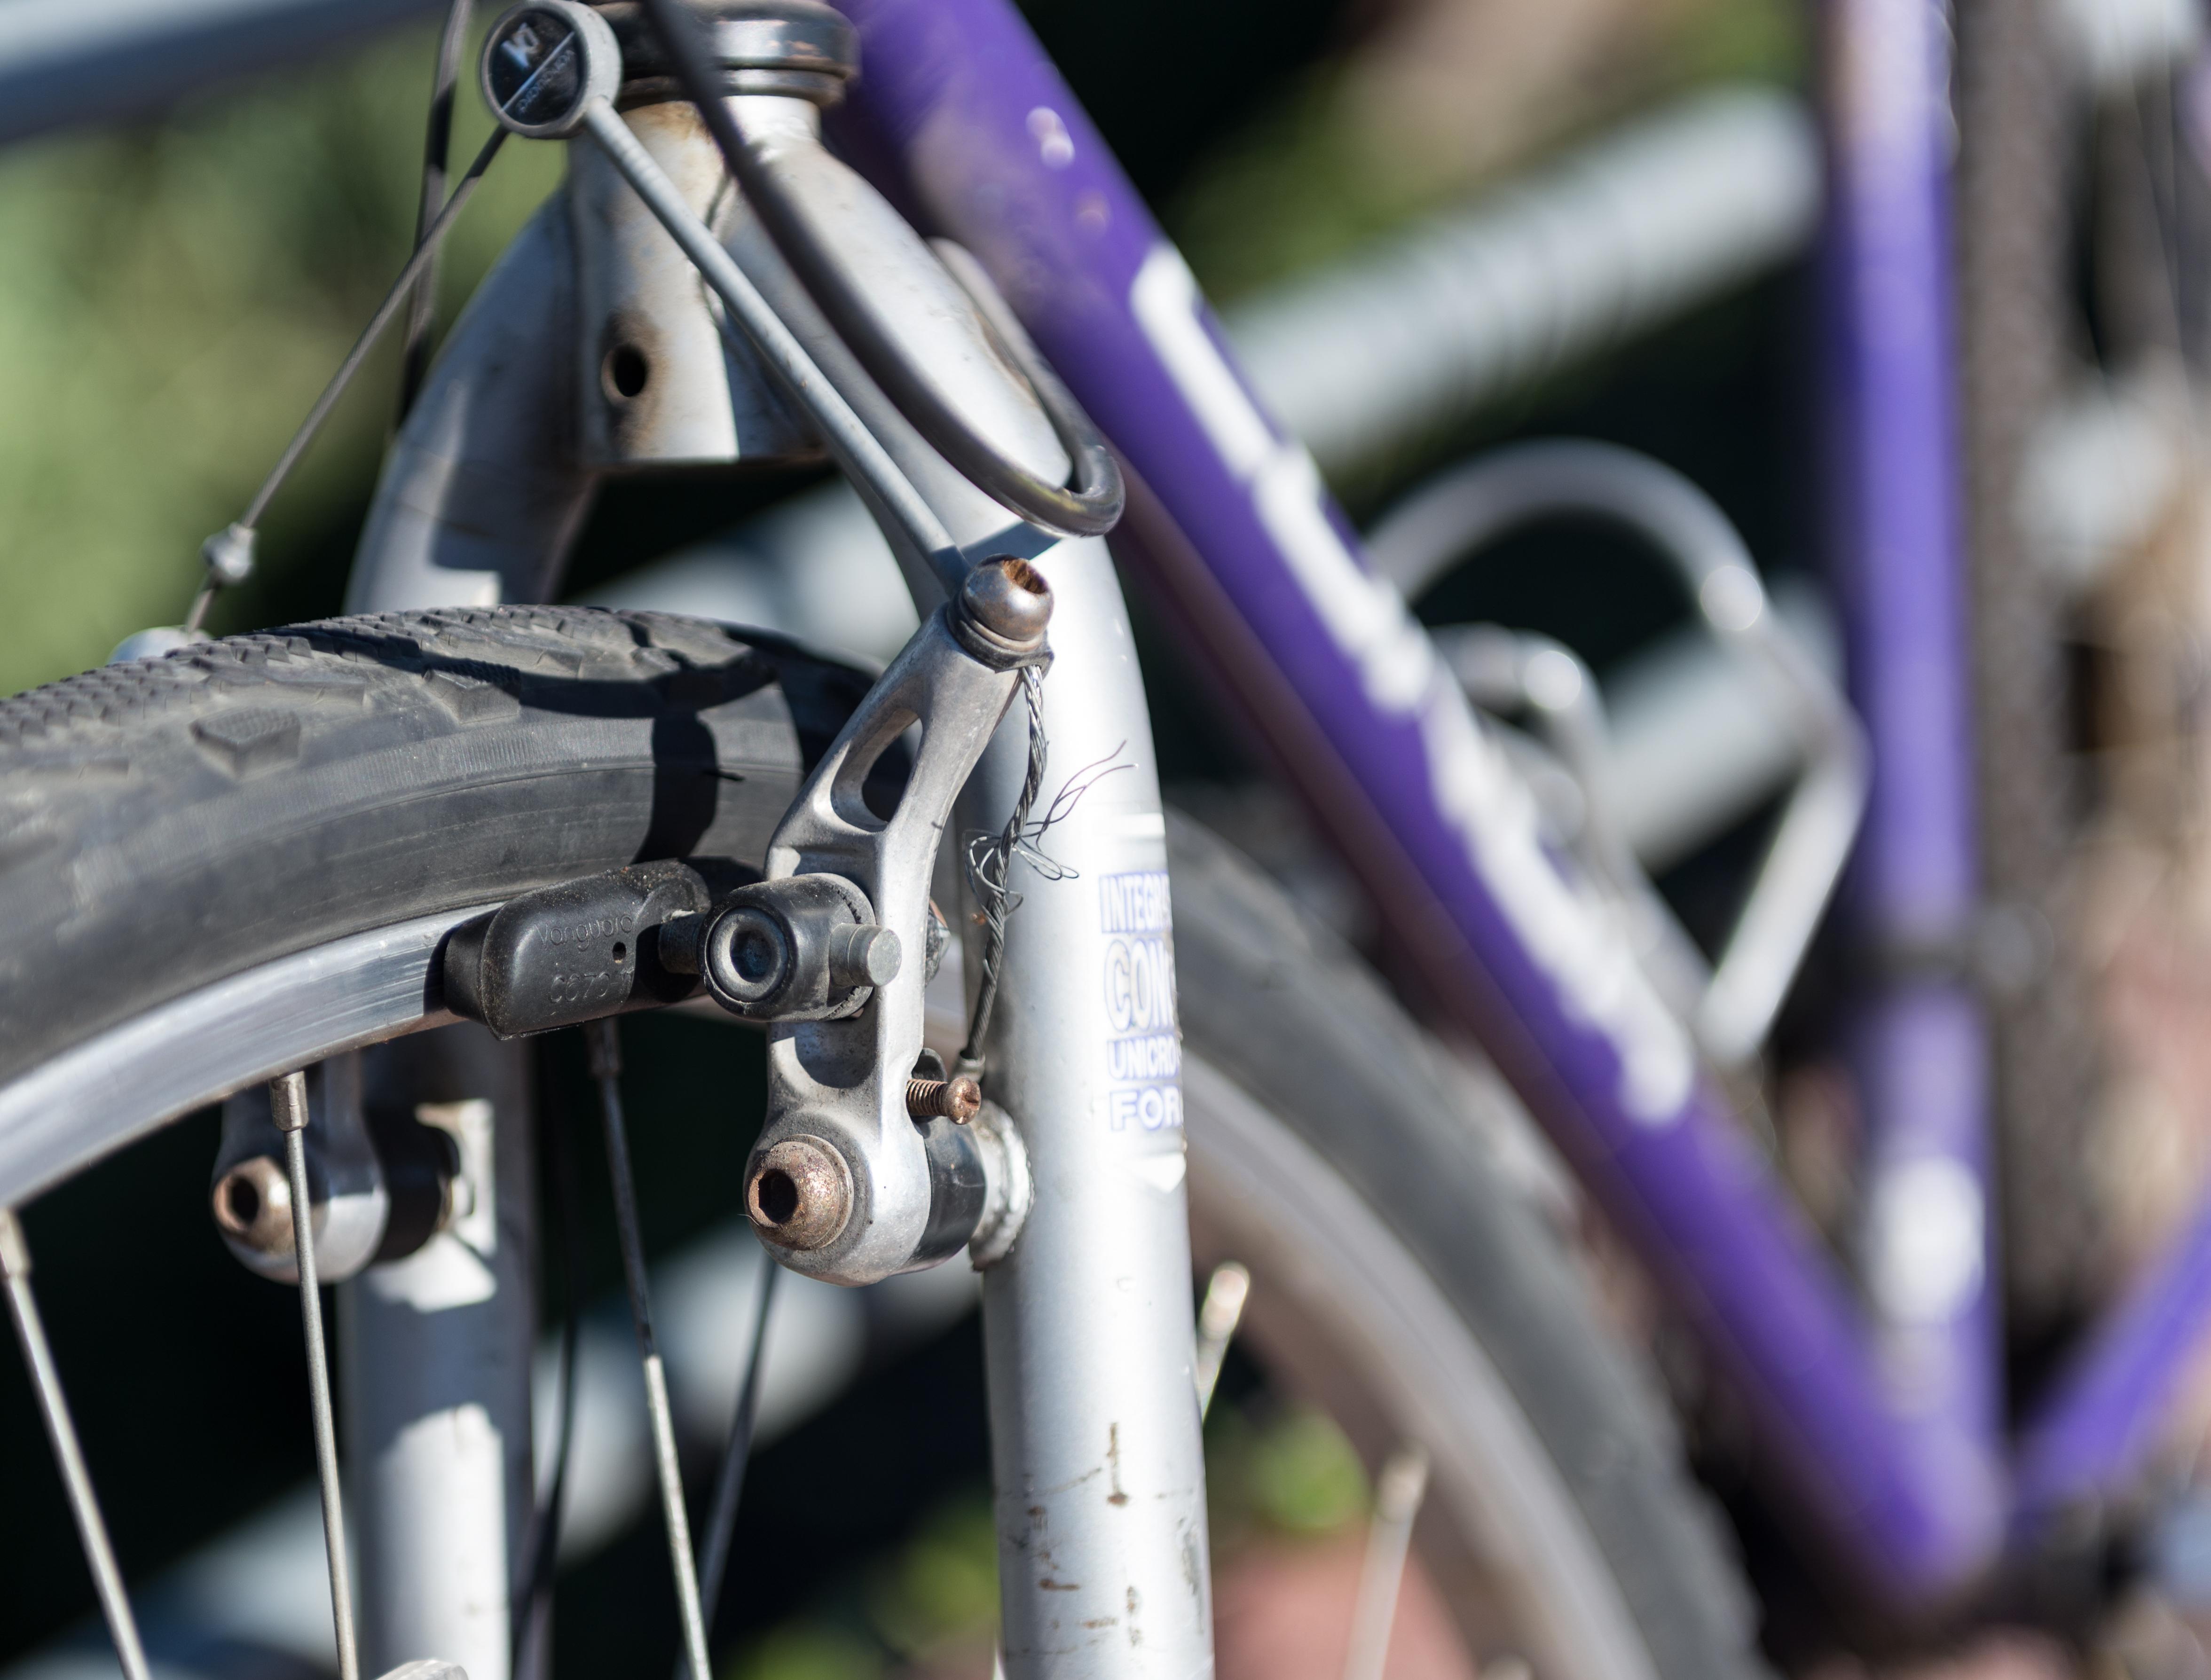 15-10-28-Conor bici-RalfR-WMA 3035.jpg